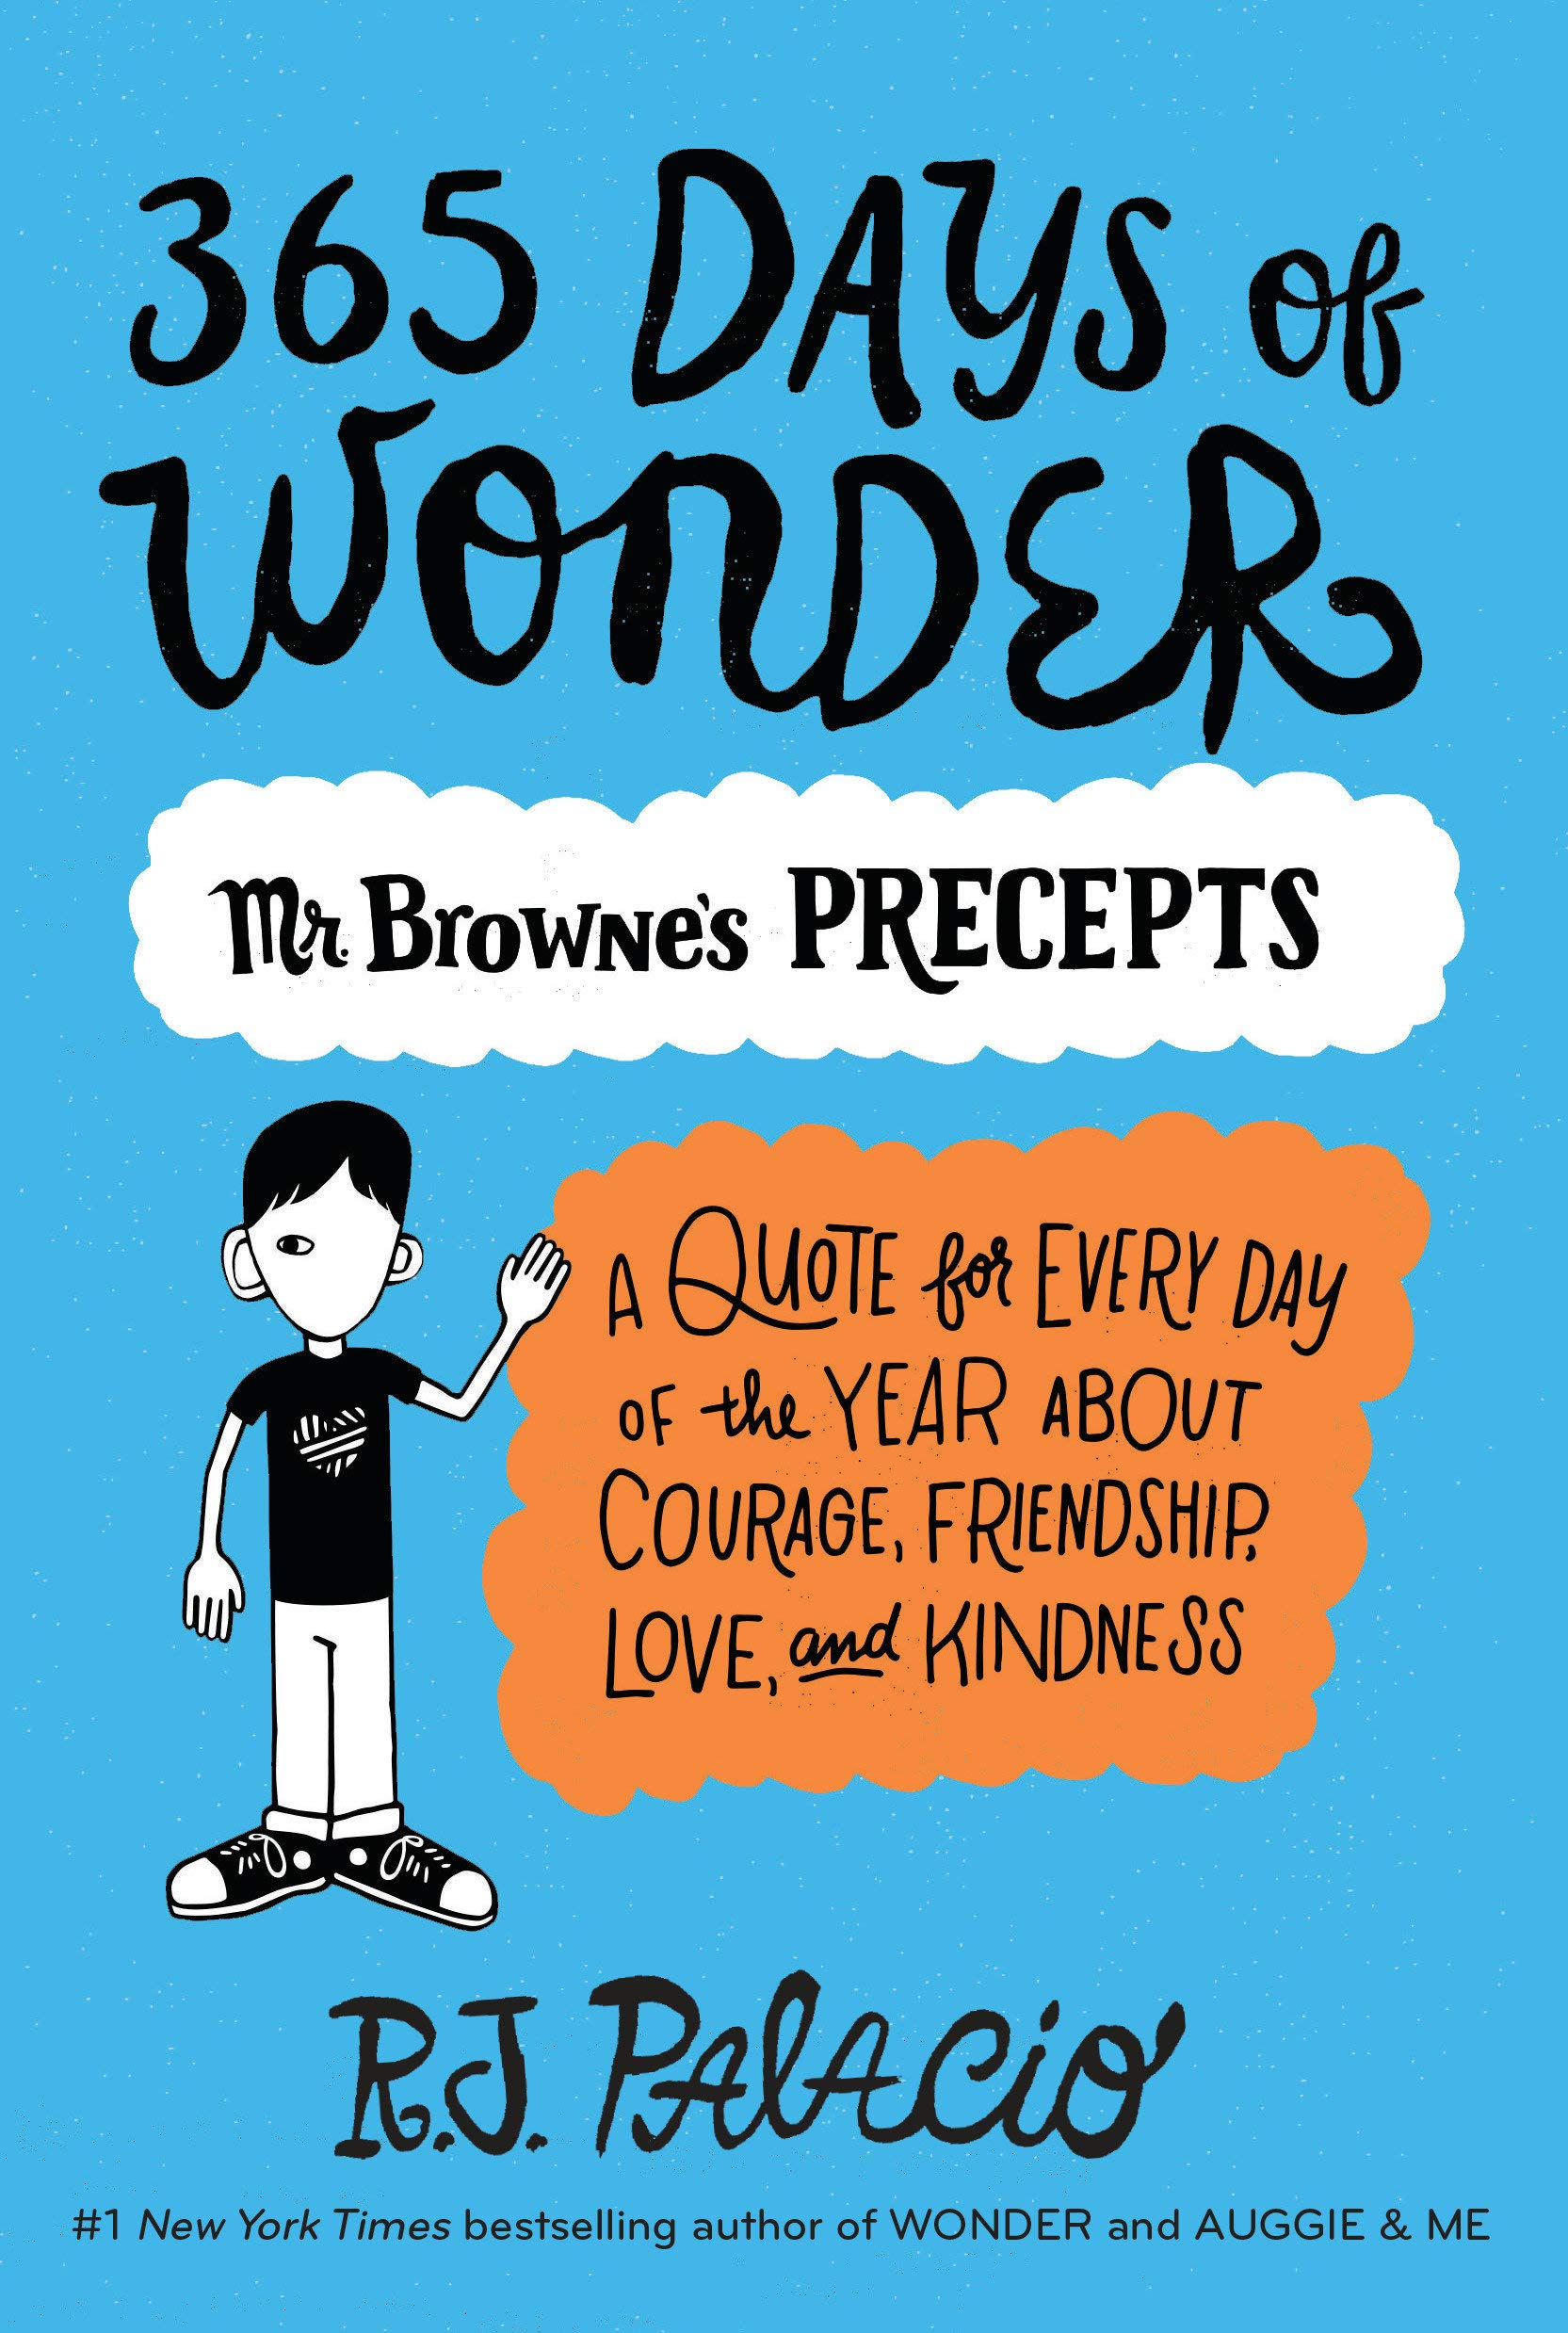 Image result for 365 days of wonder list of precepts